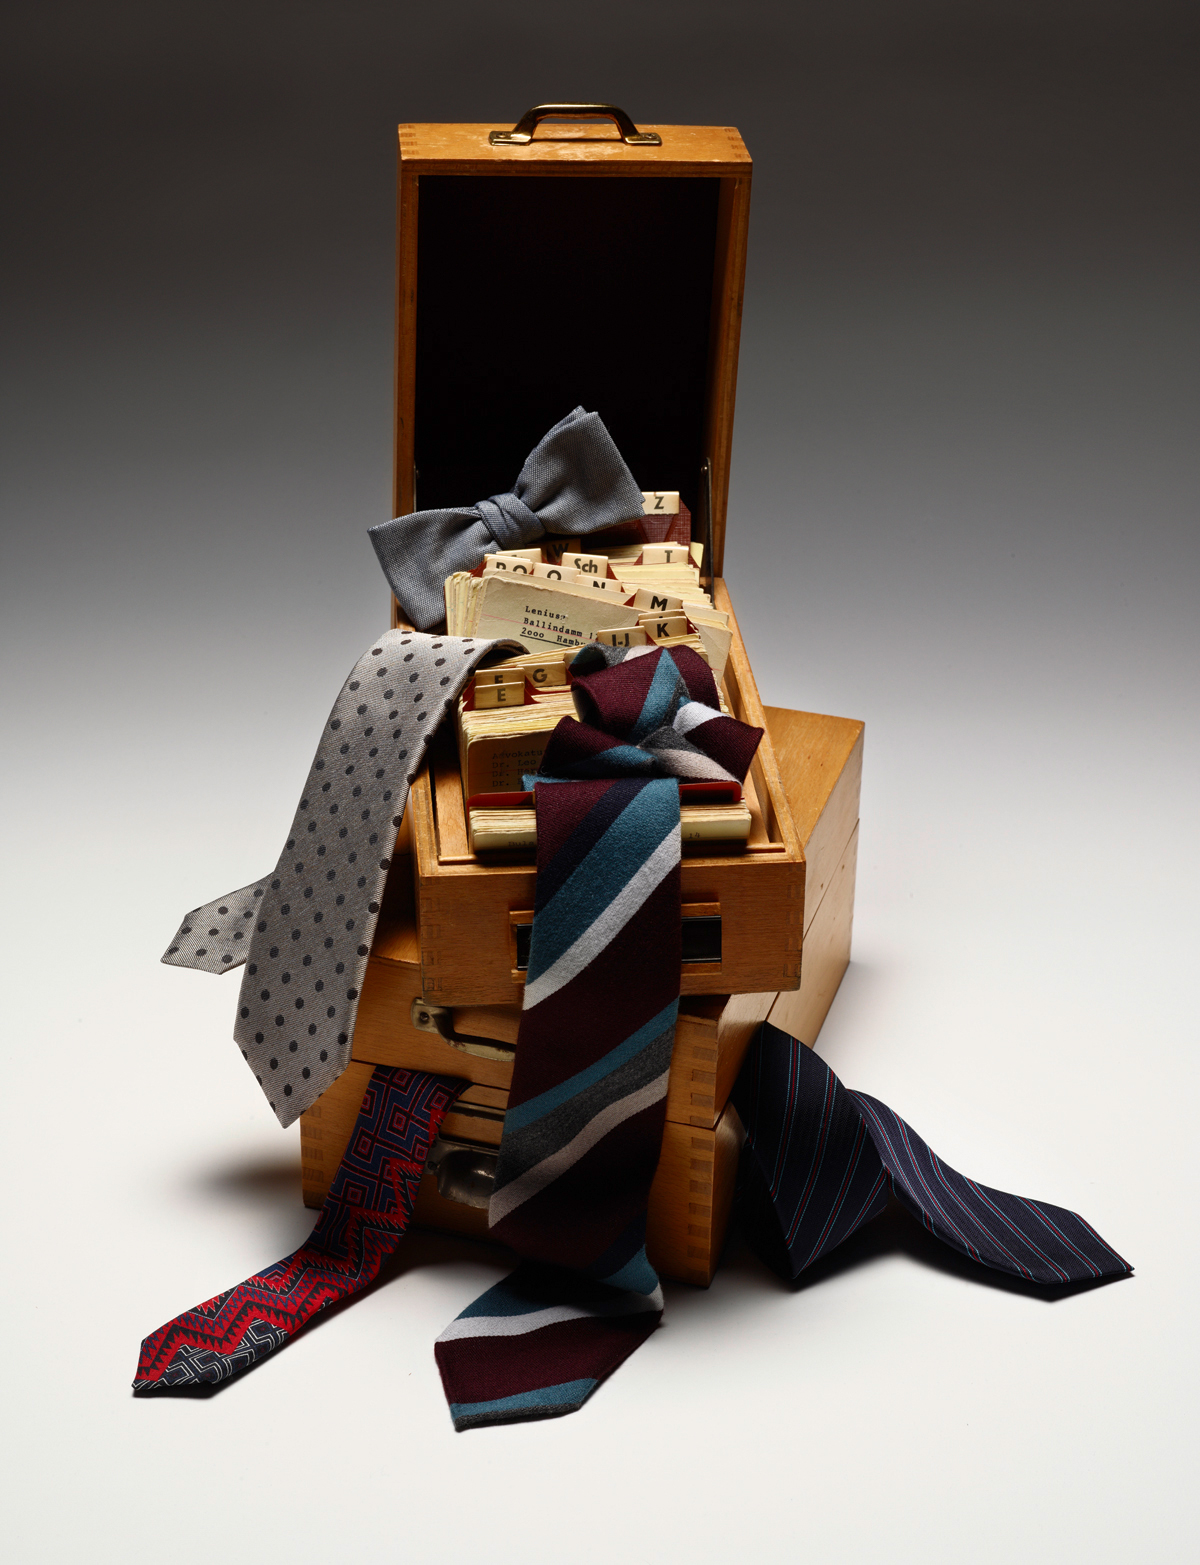 04_mh-krawatten